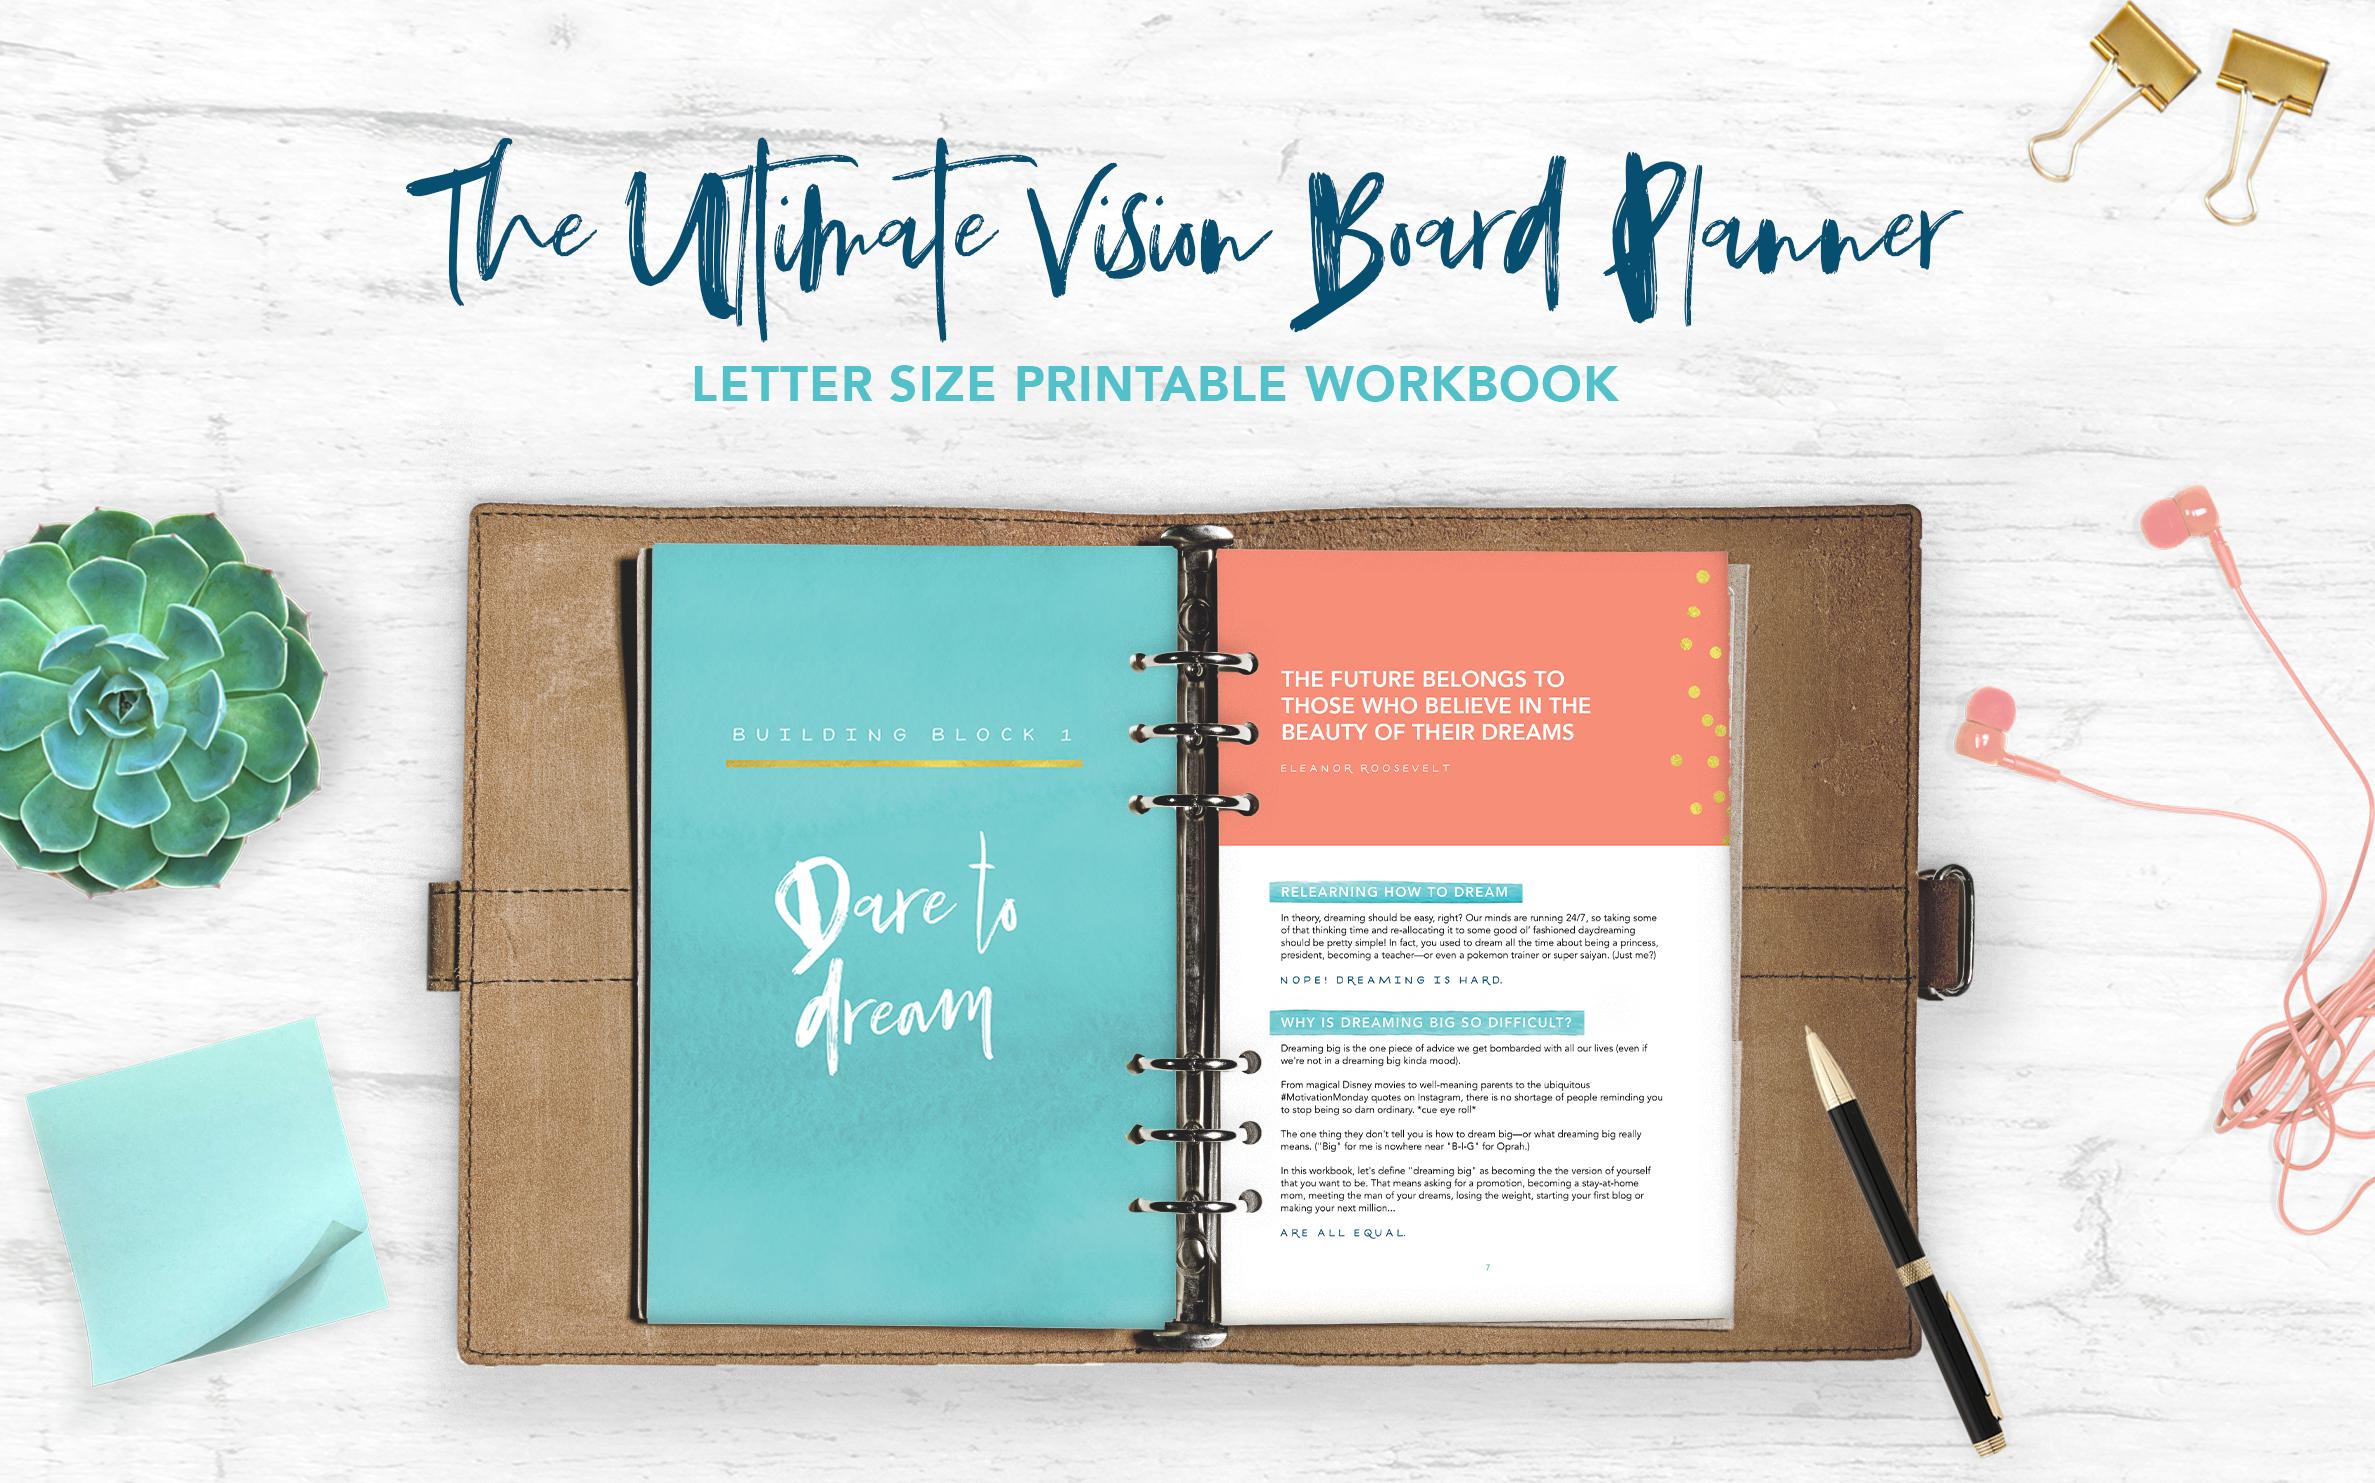 vision board planner